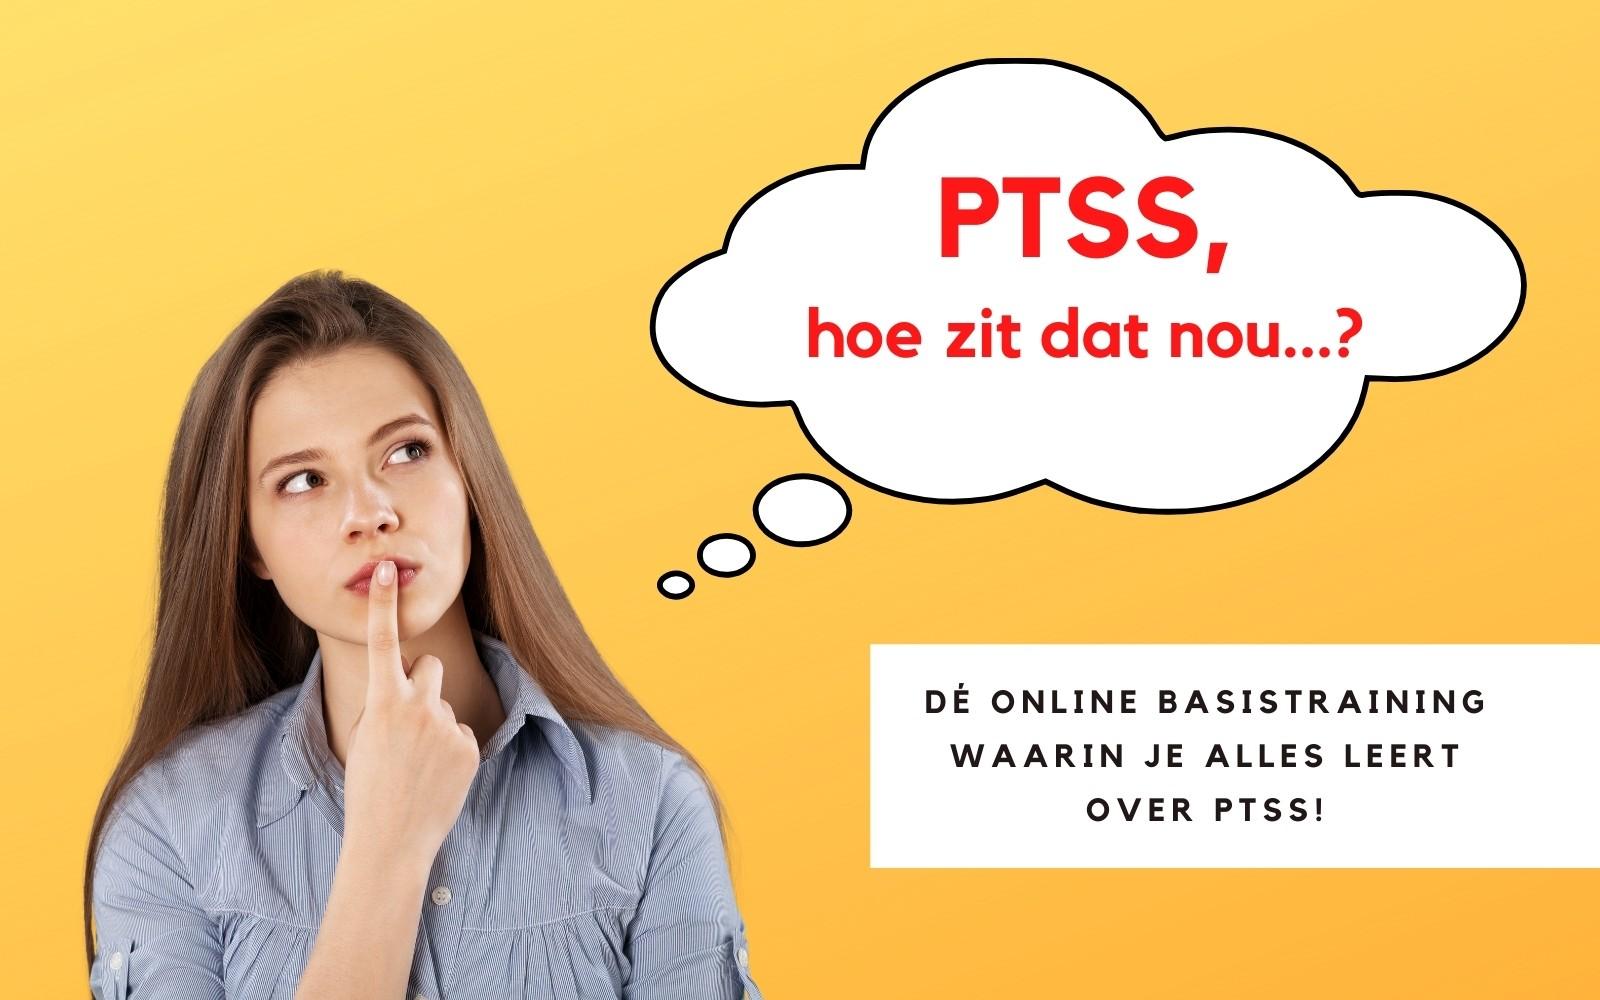 PTSS, Hoe zit dat nou…? Poster